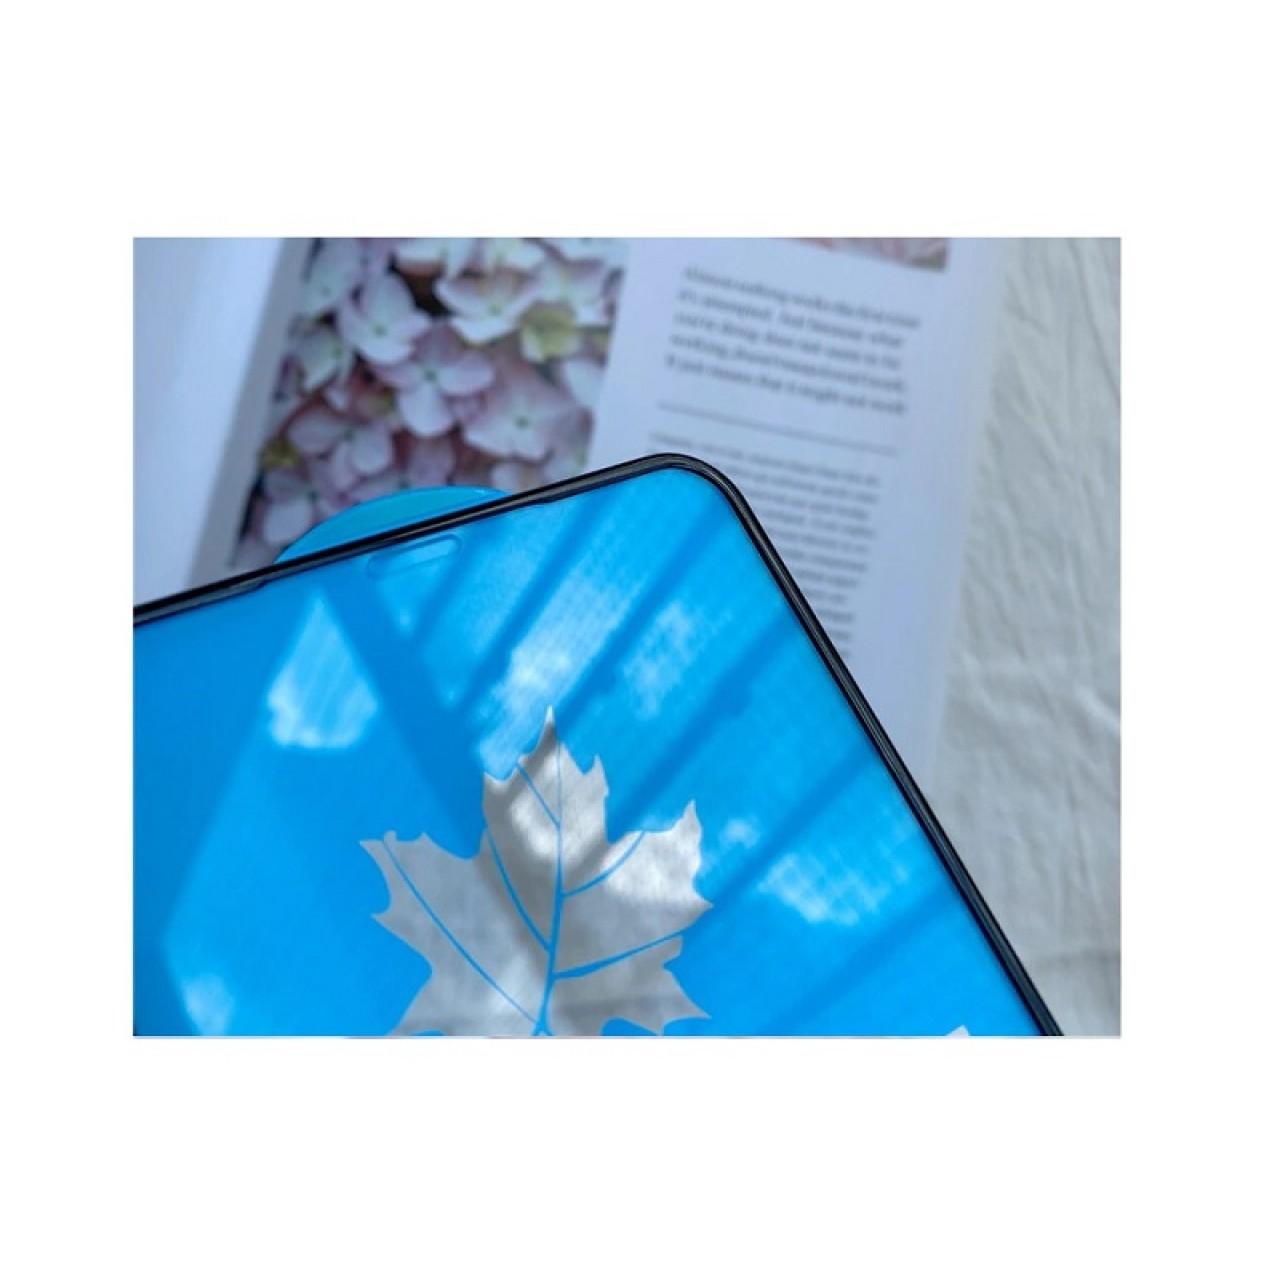 AIRBAG TEMPERED GLASS PREMIUM FULL FACE 18D - ΠΡΟΣΤΑΤΕΥΤΙΚΟ ΤΖΑΜΙ ΟΘΟΝΗΣ ΓΙΑ iPhone 12 / 12 Pro - BLACK